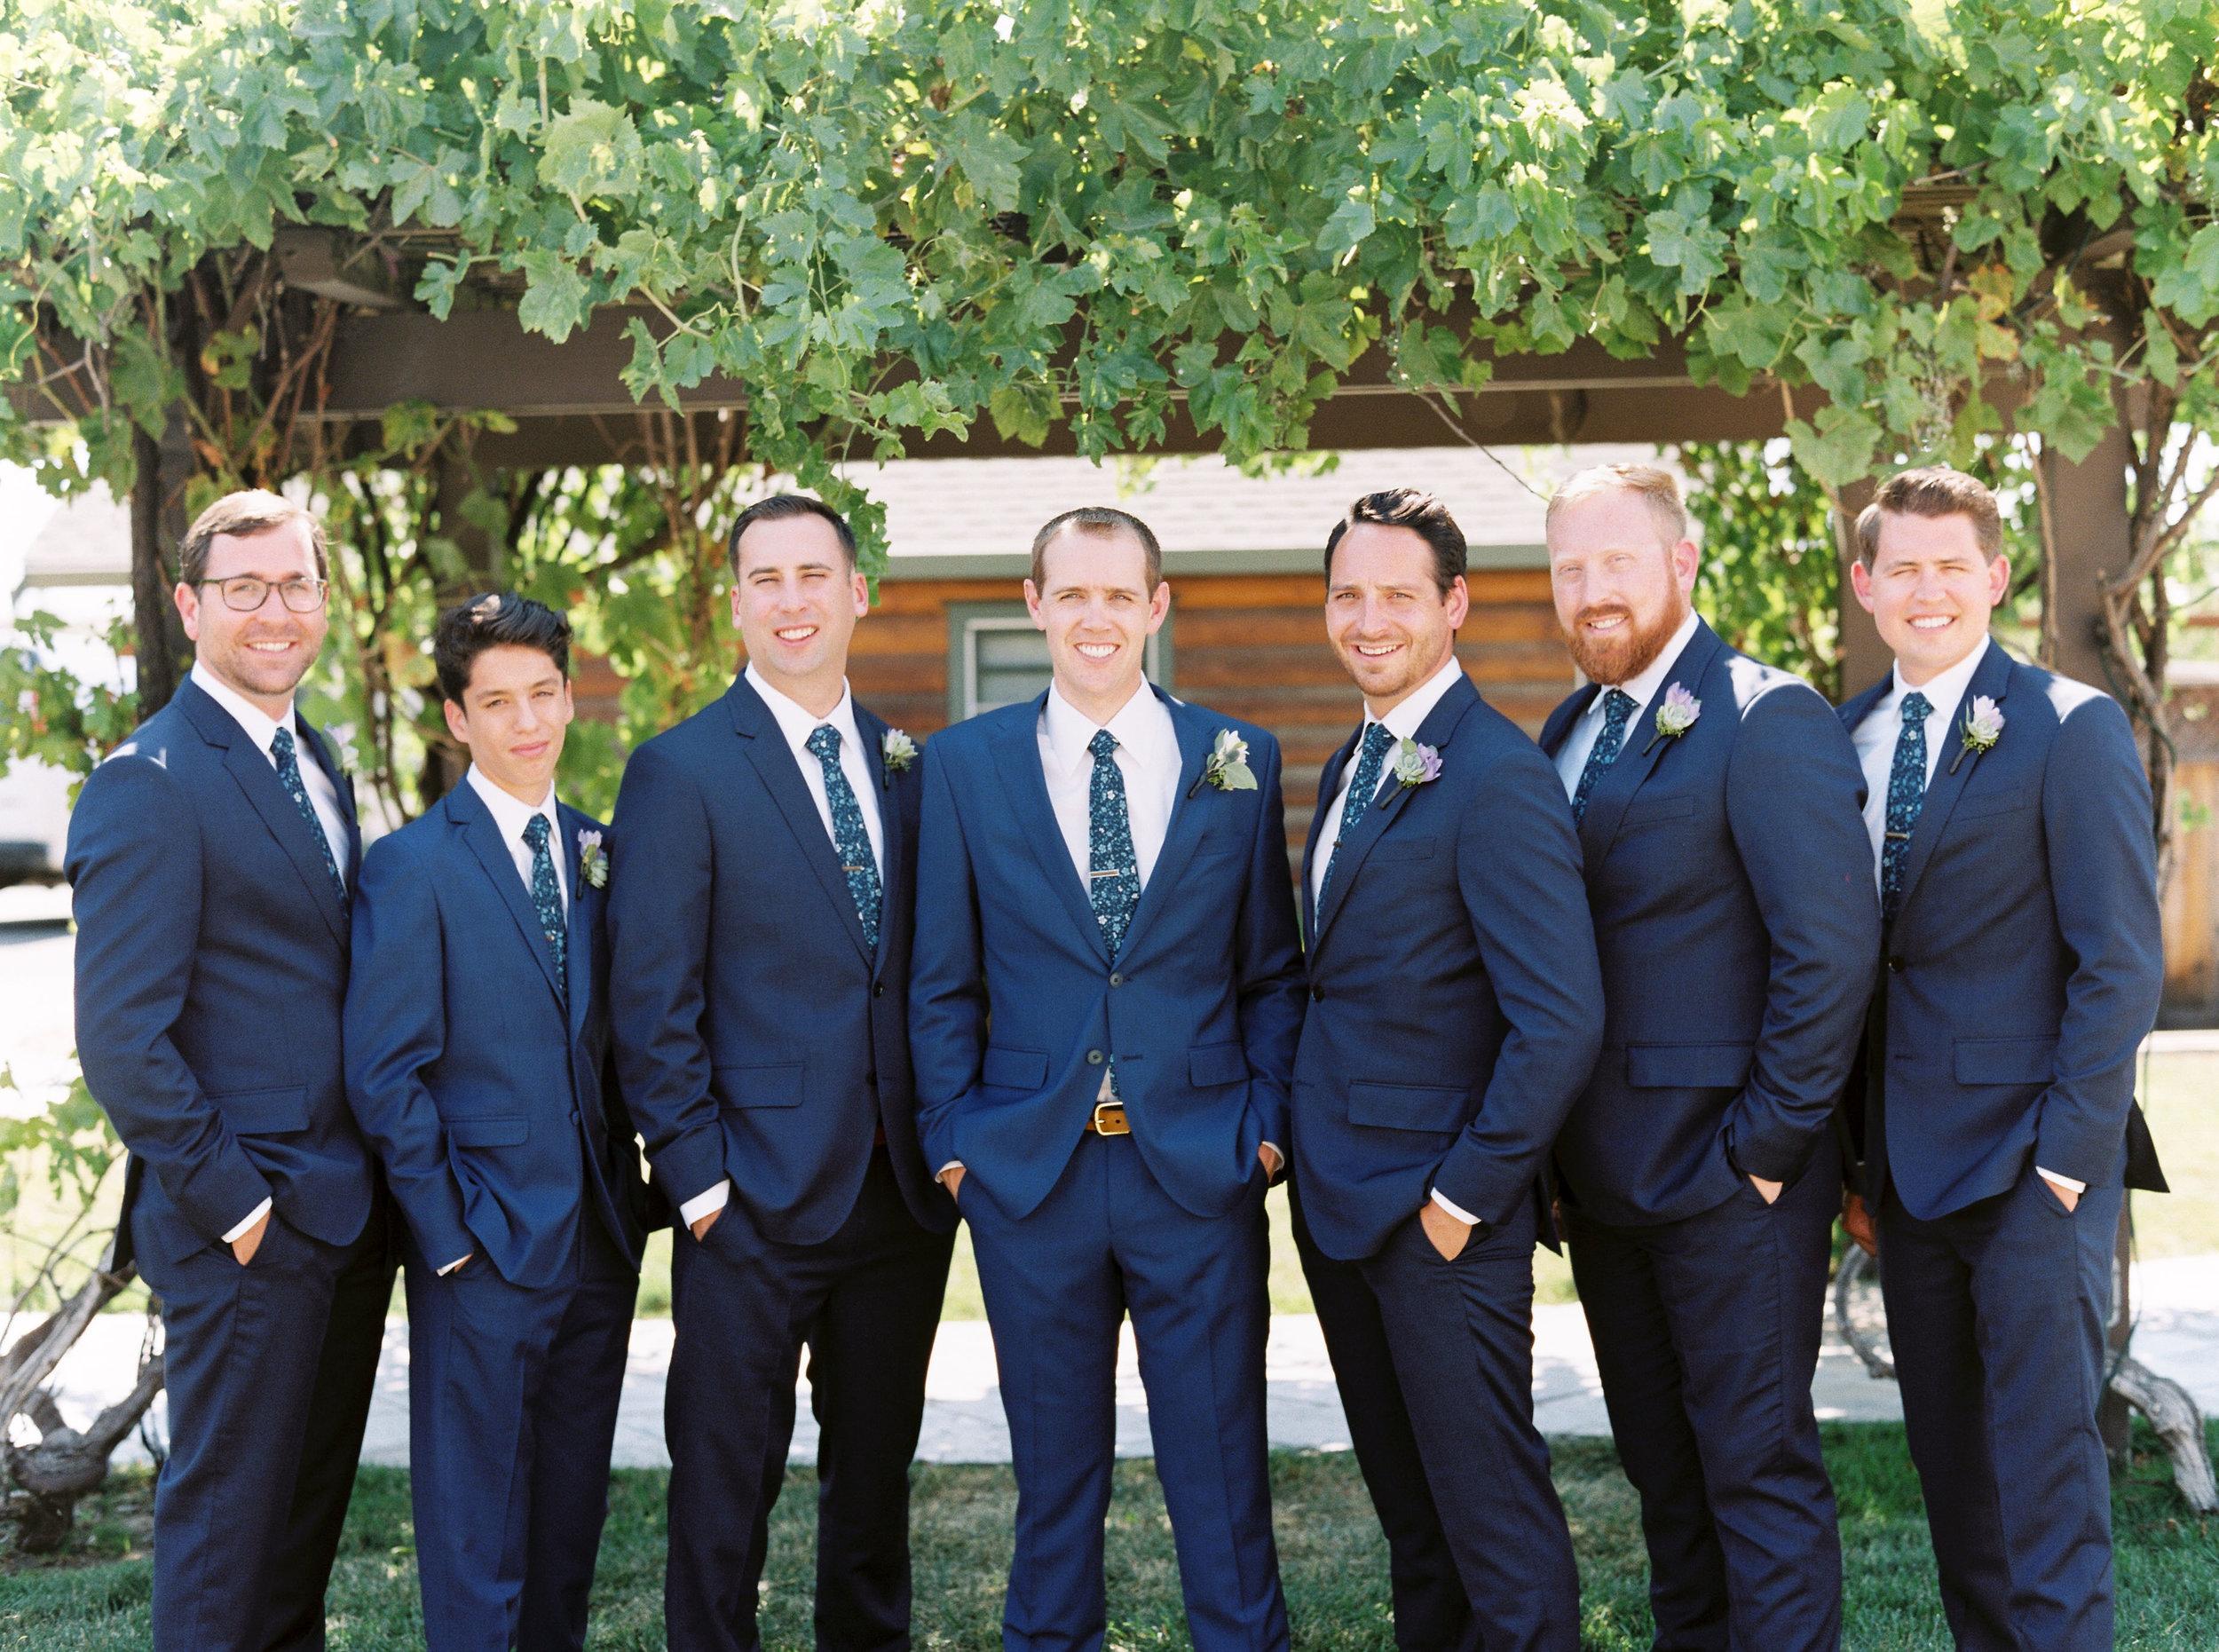 the-purple-orchid-resort-wedding-in-livermore-california-215.jpg